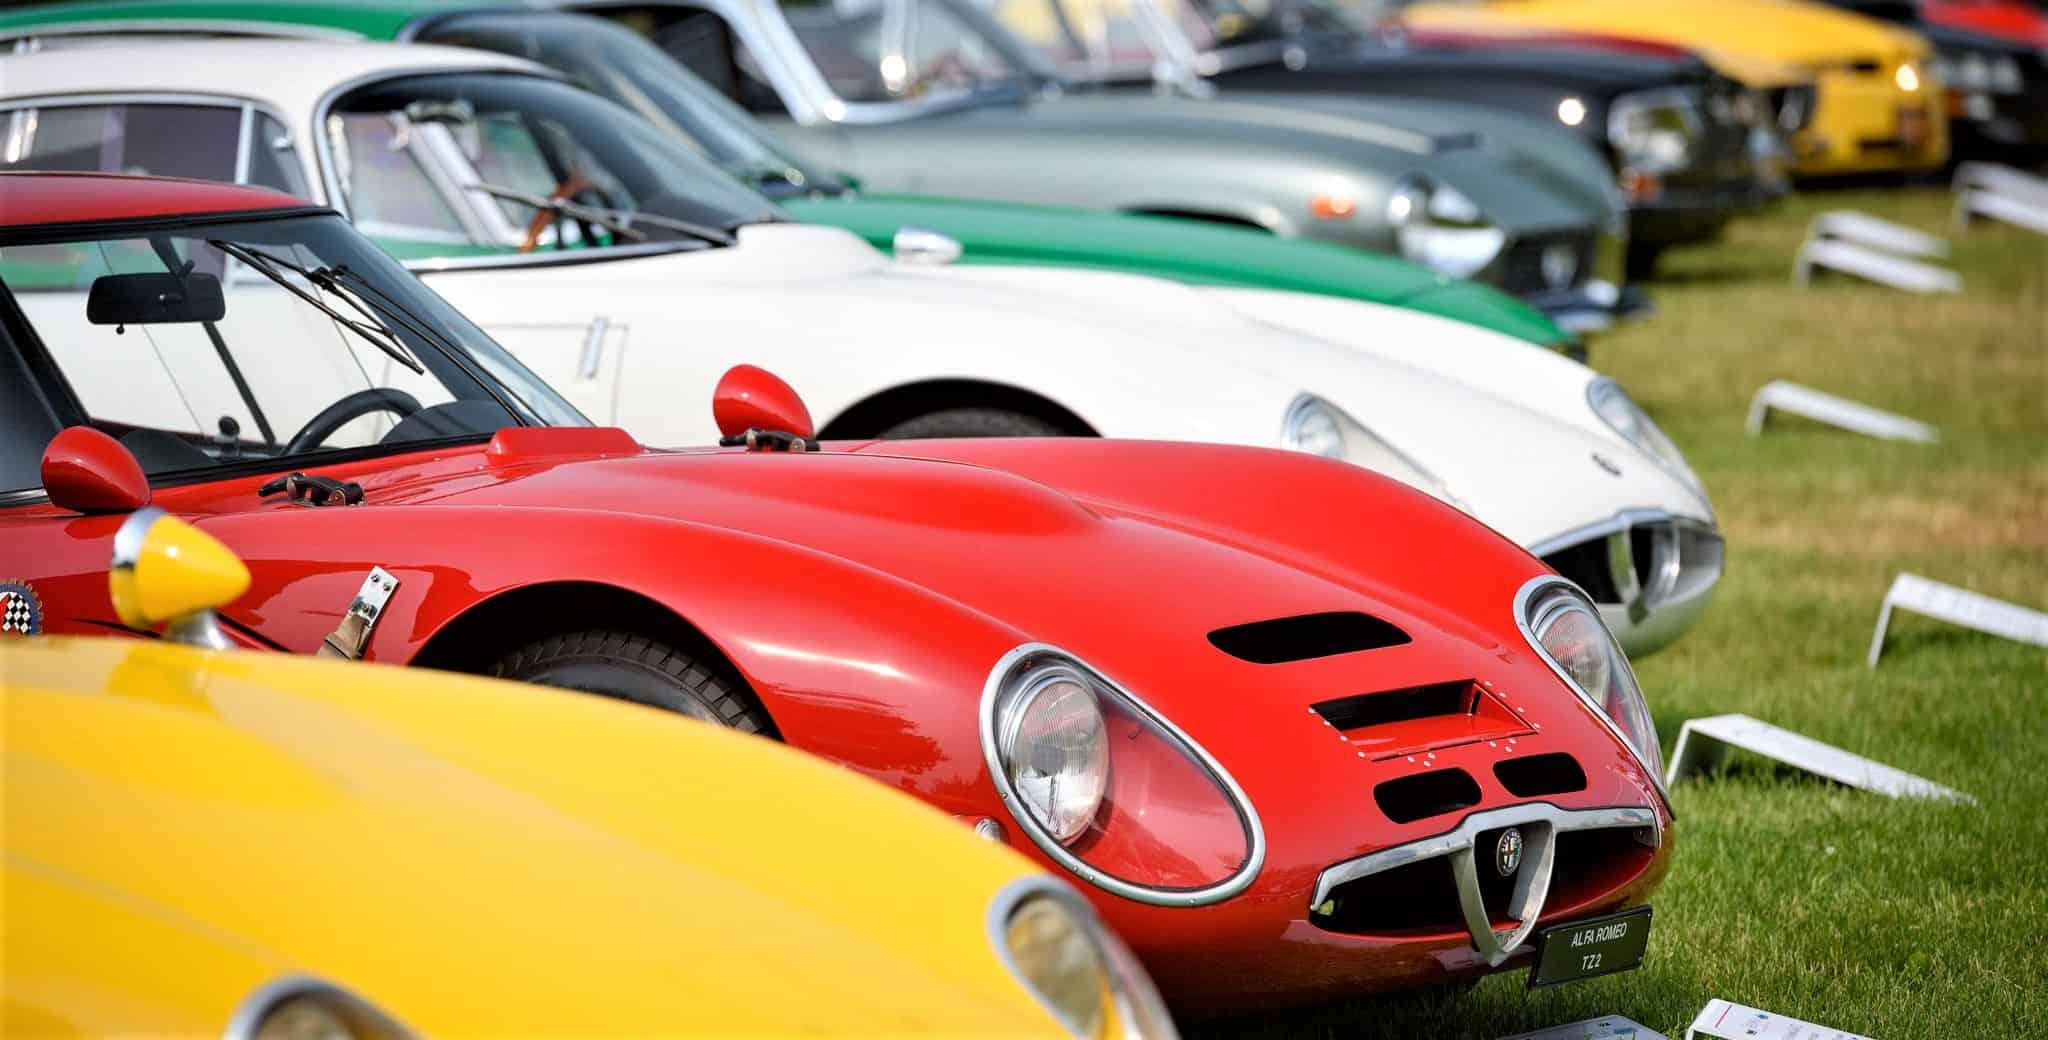 carlisle, Carlisle Event's Winter Autofest, plus other concours and event news, ClassicCars.com Journal